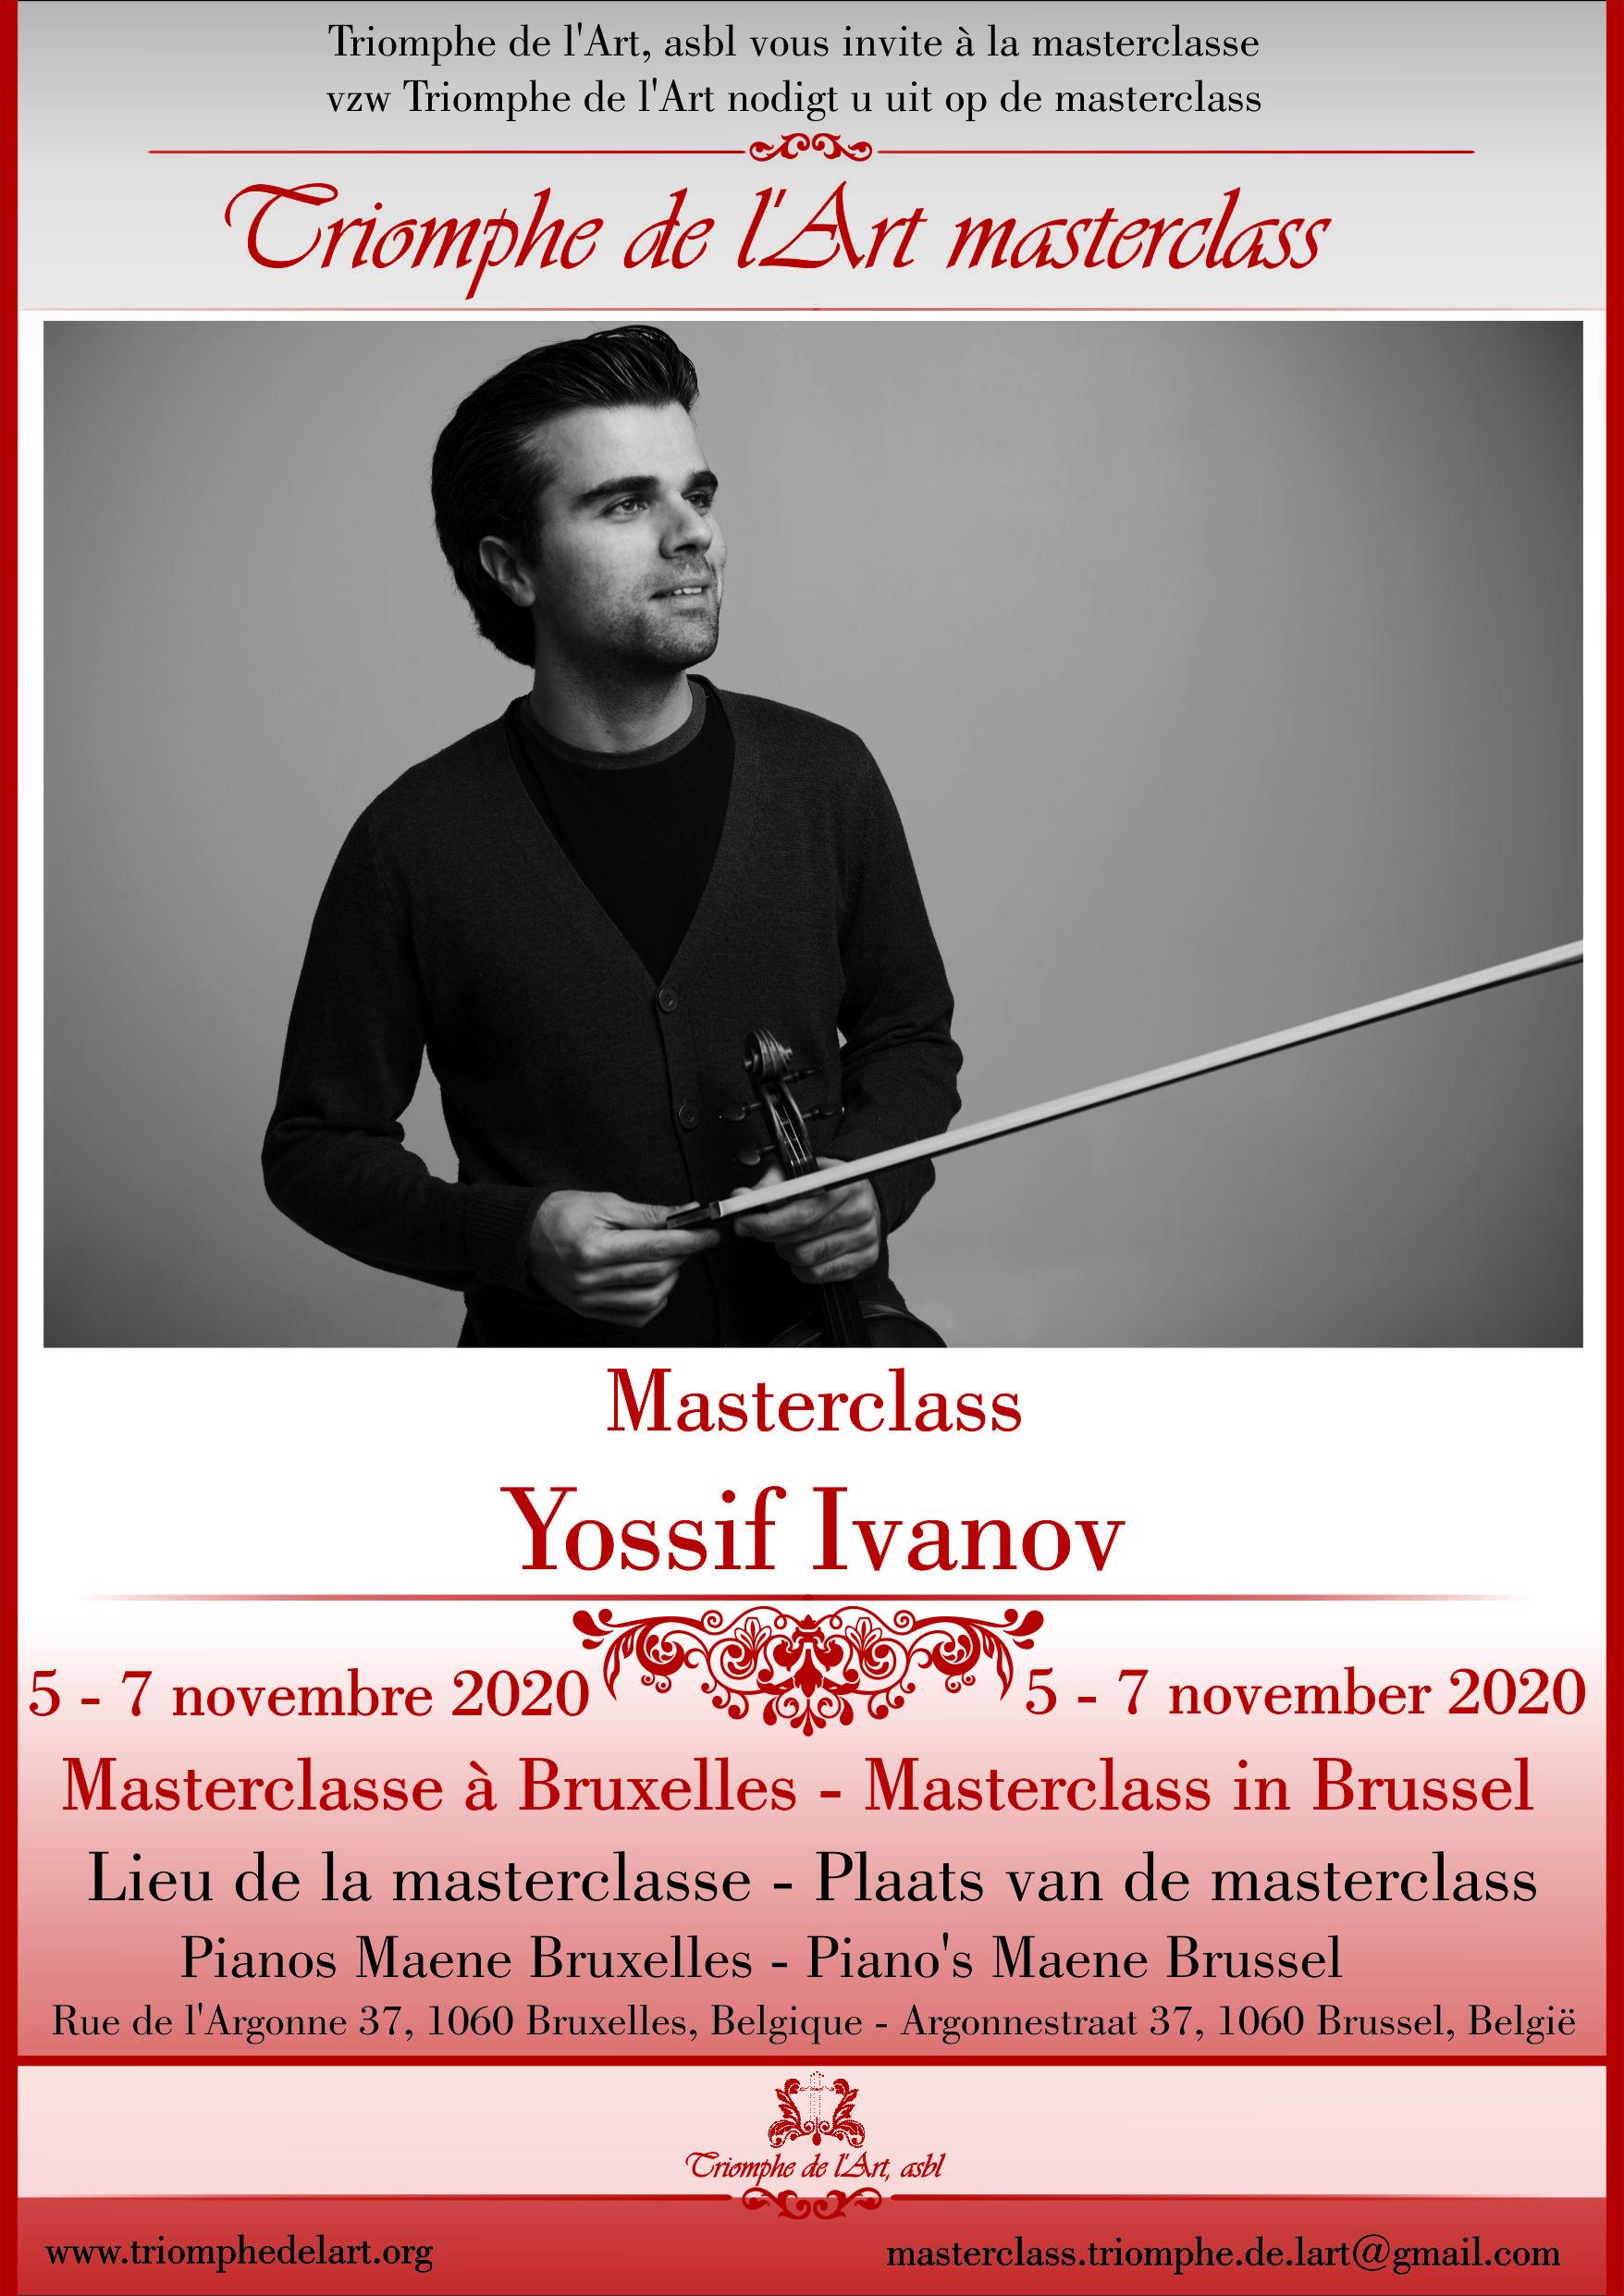 Yossif Ivanov violin masterclass 2020